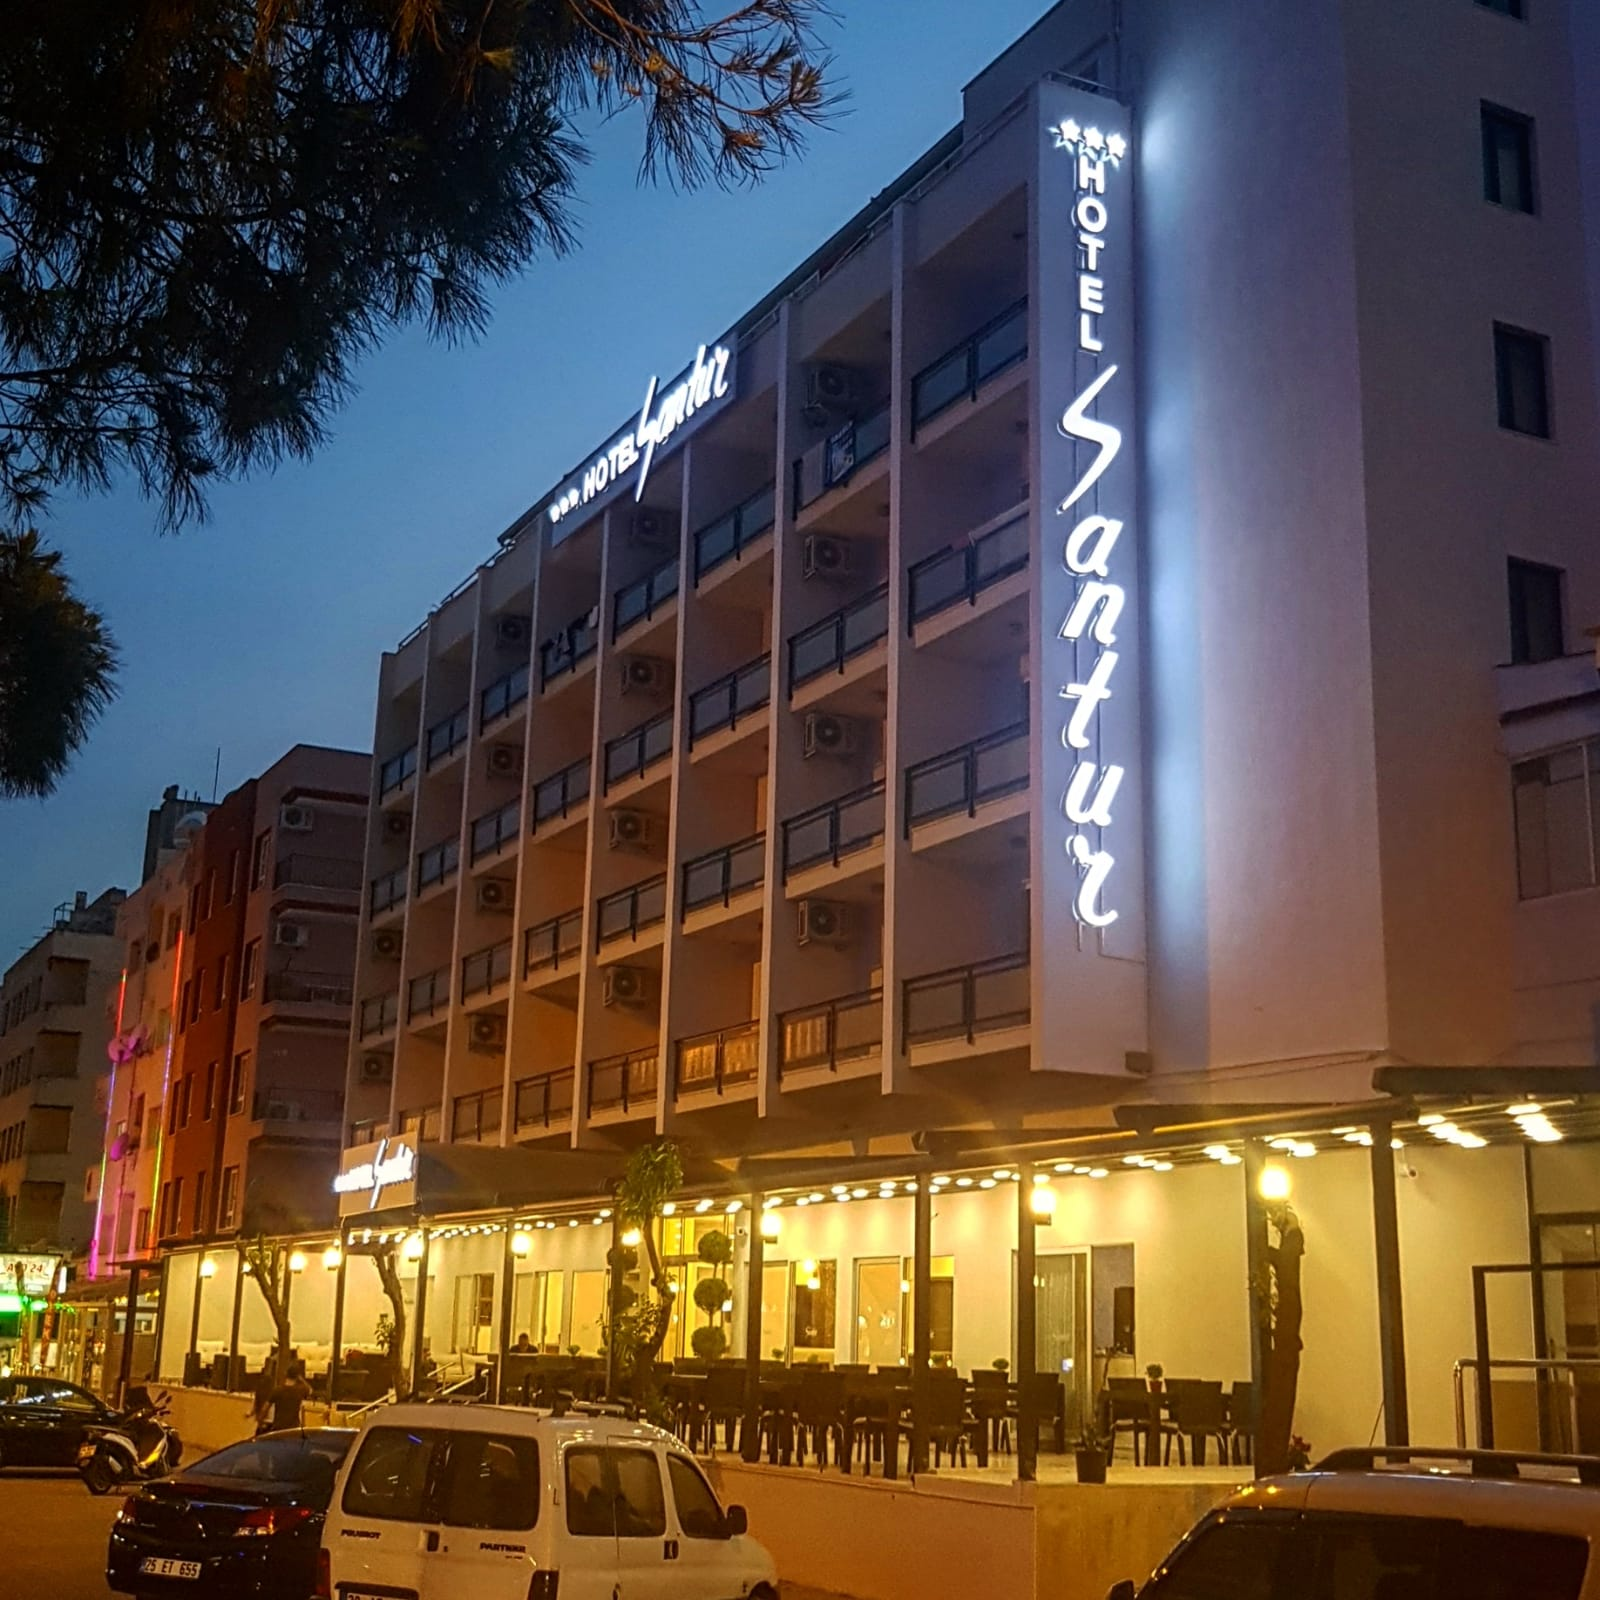 Letovanje Turska autobusom, Kusadasi, Hotel Santur,eksterijer